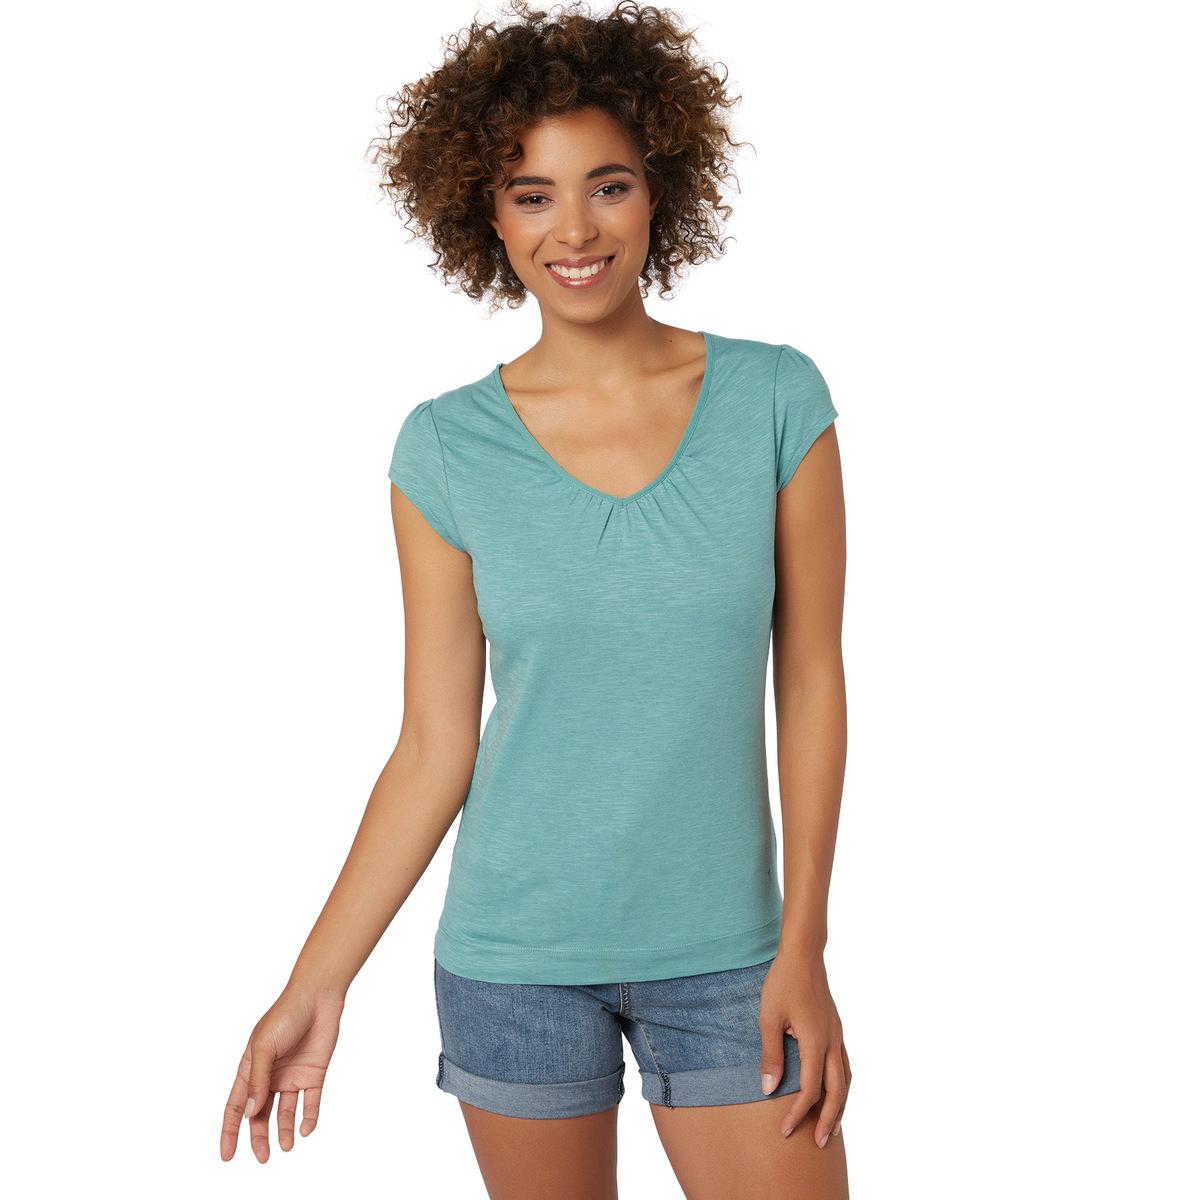 T-Shirt Valea mit gerafftem Ausschnitt in light aqua